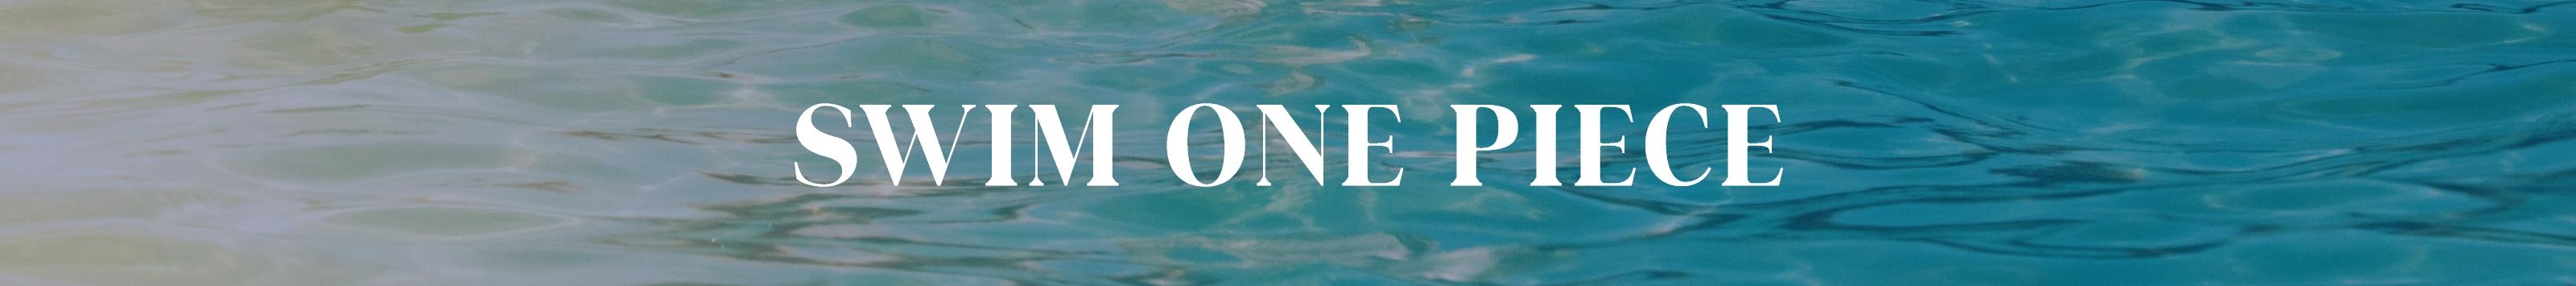 banner-category-swim-swimonepiece-1.jpg